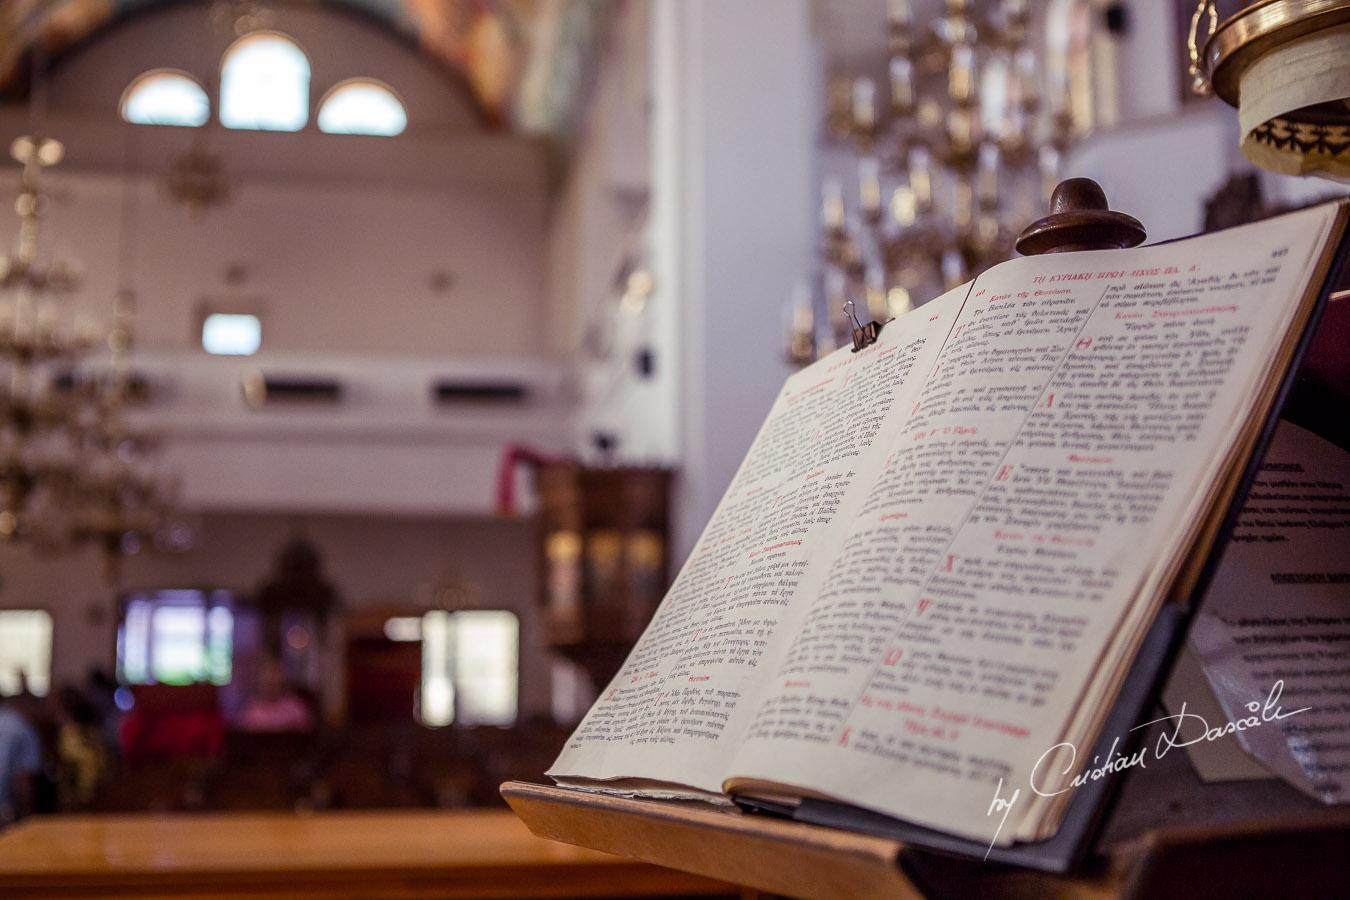 Christening in Limassol - Rares Ionut. Photographer: Cristian Dascalu